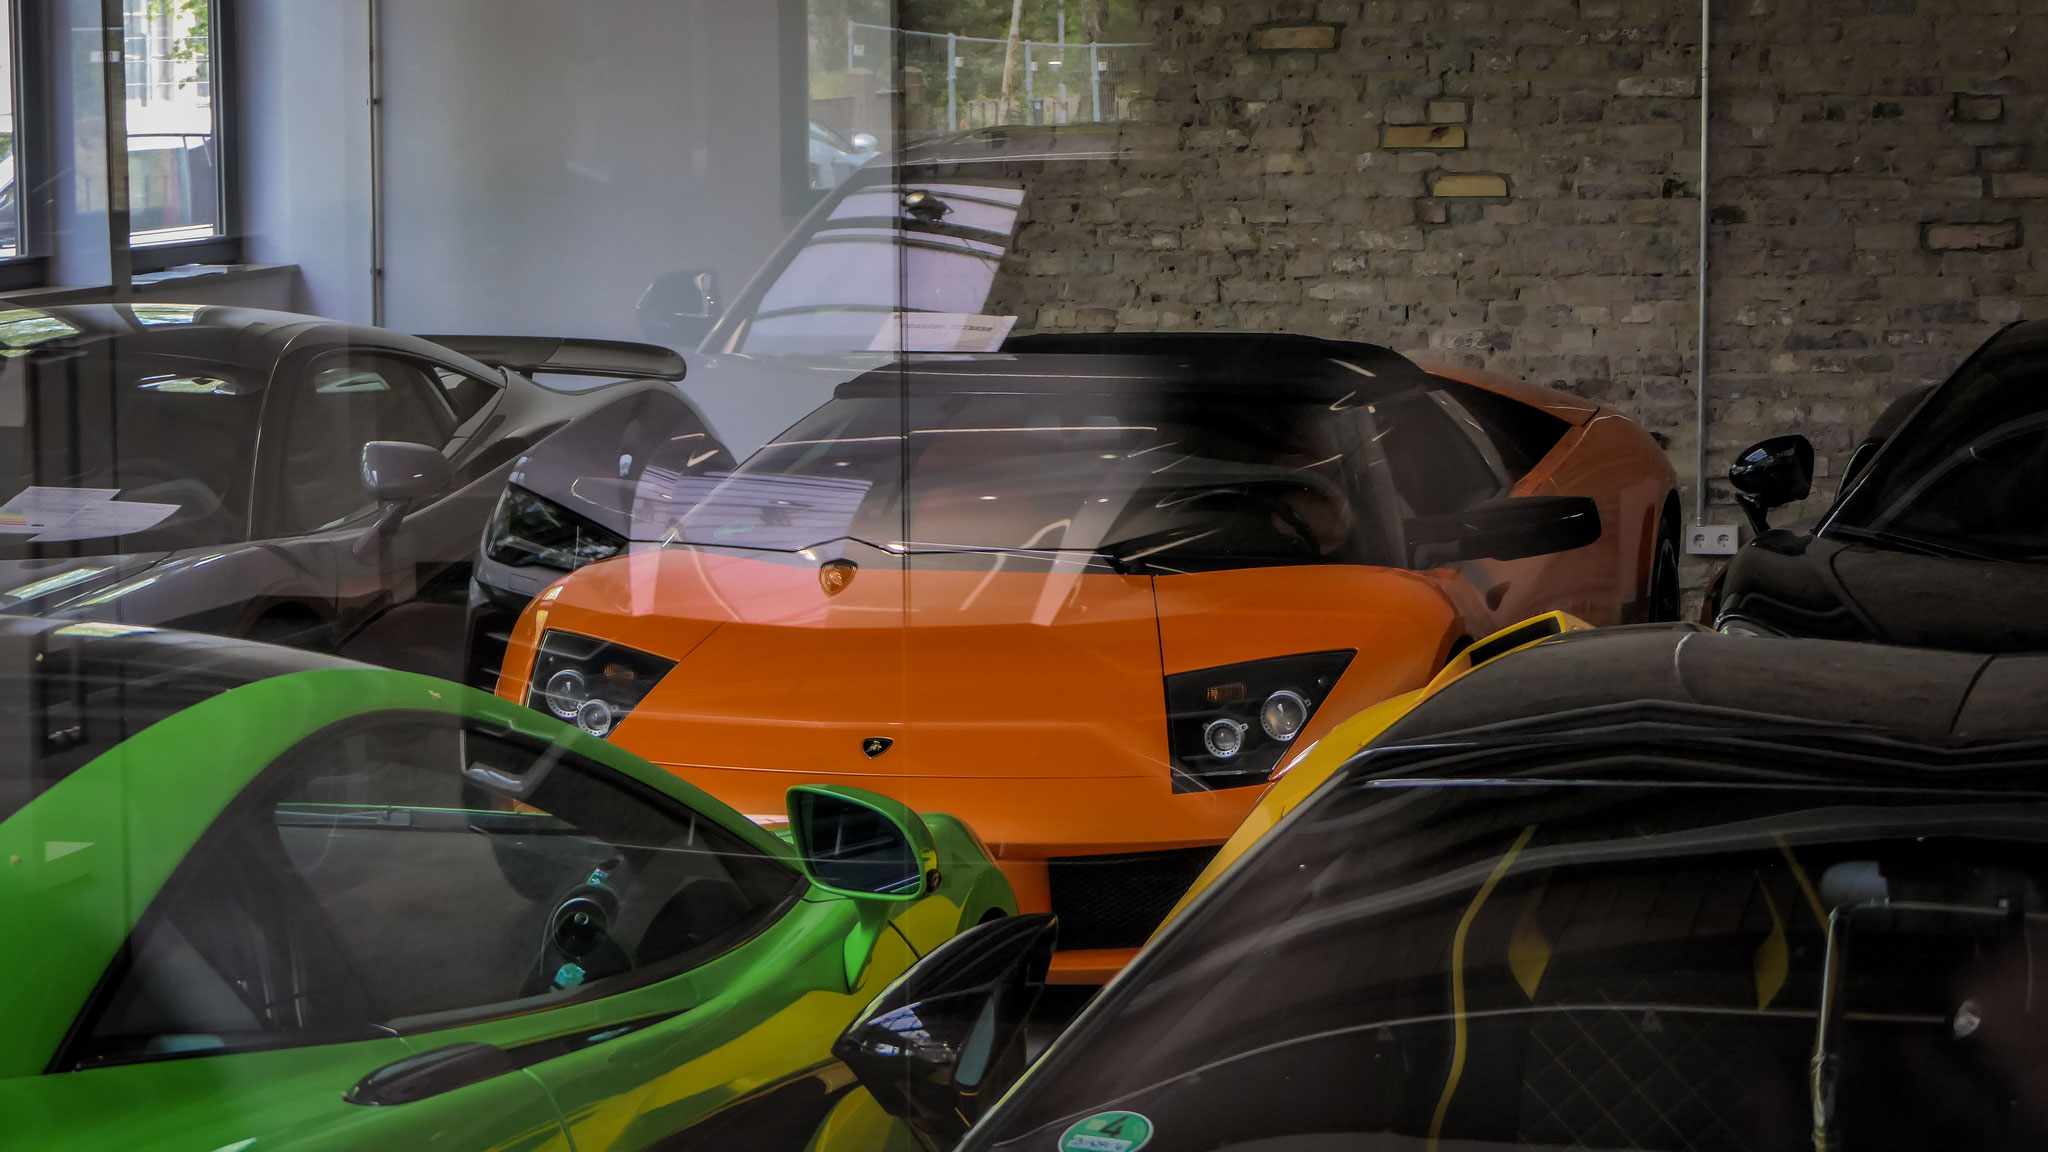 Lamborghini Murcielago Roadster - B-CT-1496